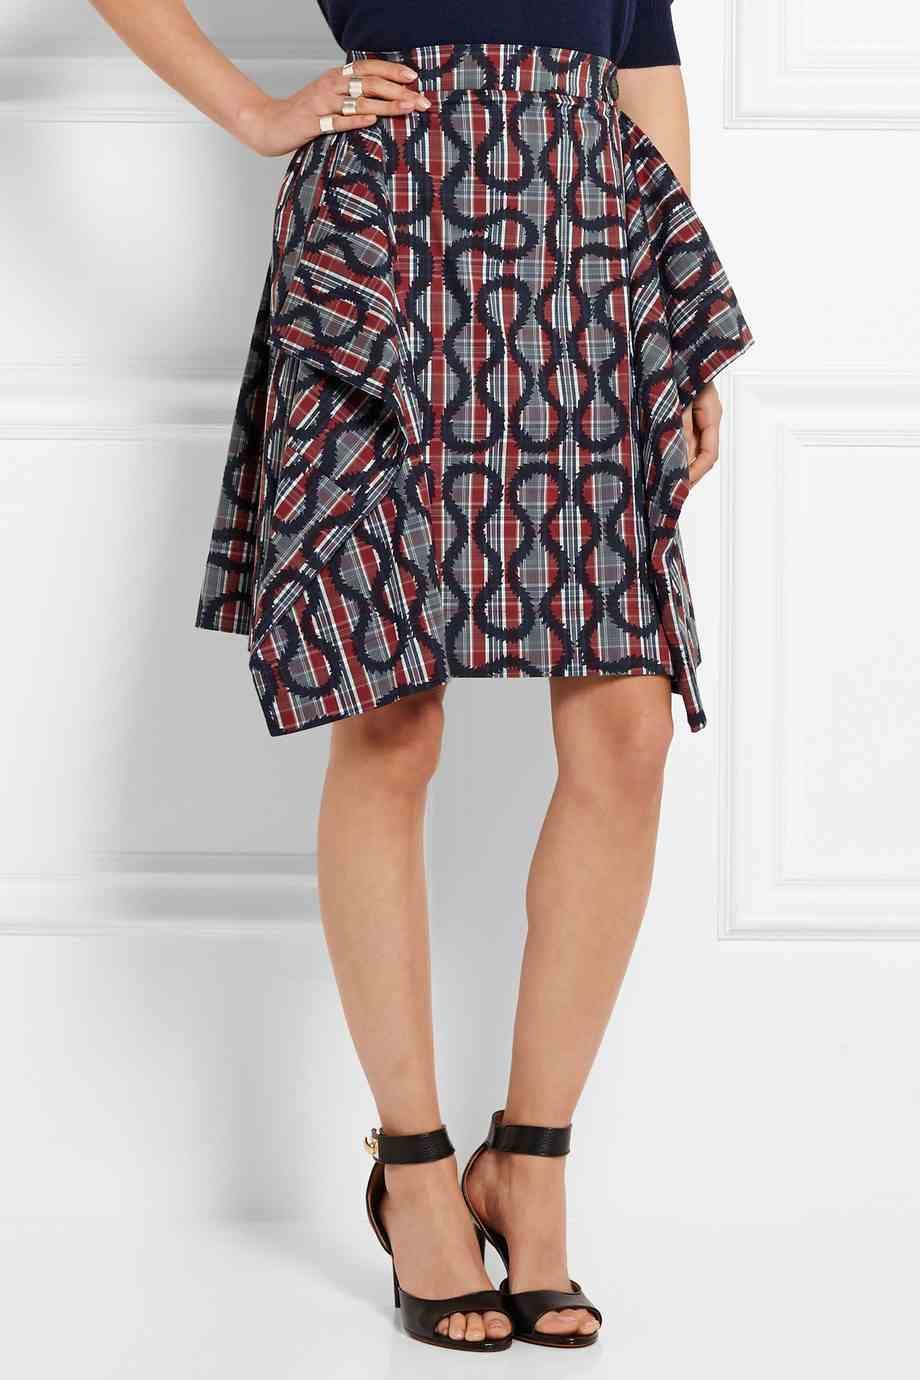 Vivienne Westwood Anglomania - Jupe(315 €)